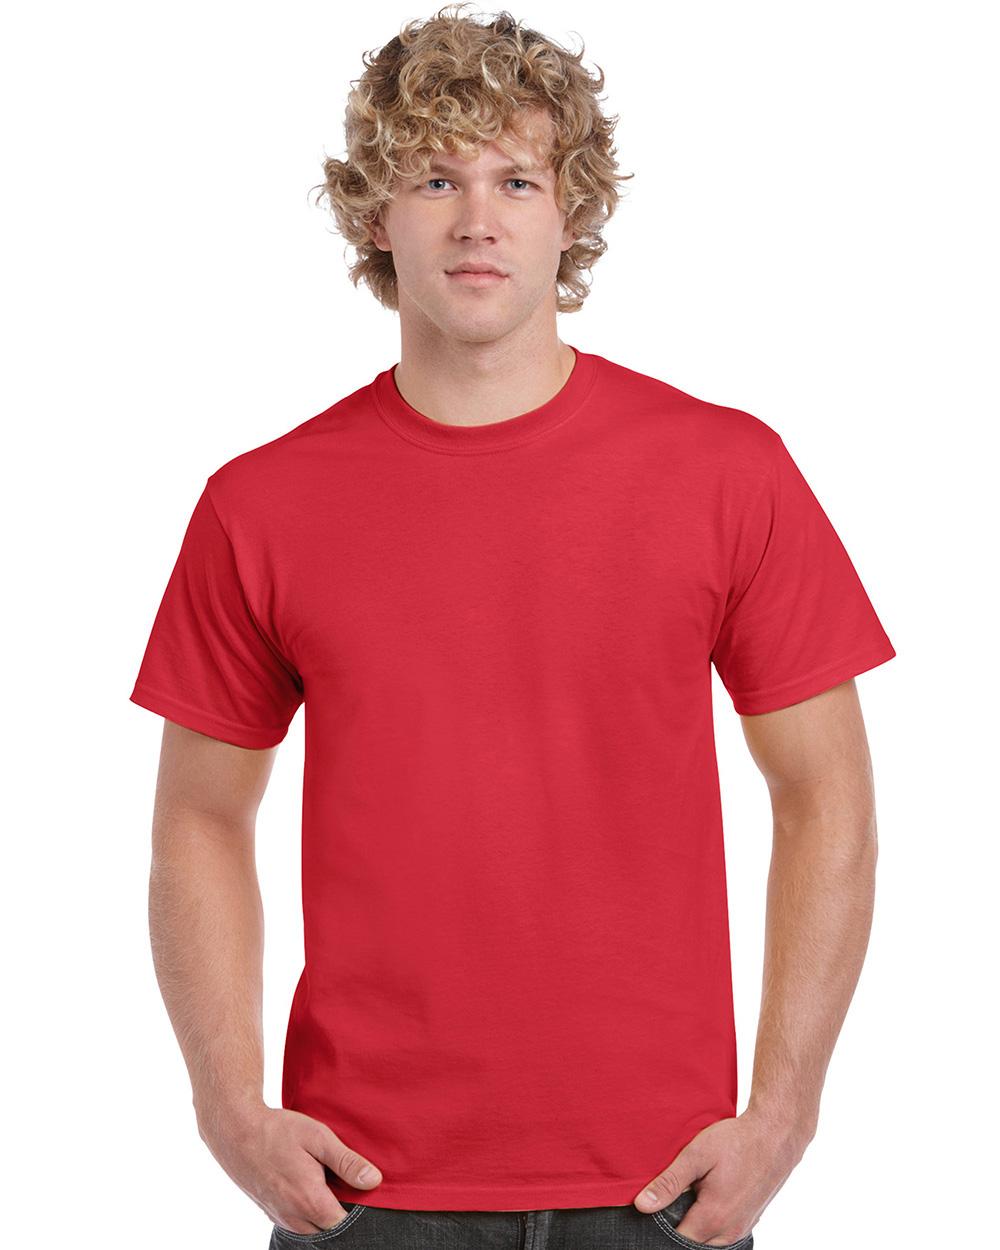 Gildan   2000     Ultra Cotton™    Classic Fit Adult T-Shirt    6.0 oz. 100% Cotton